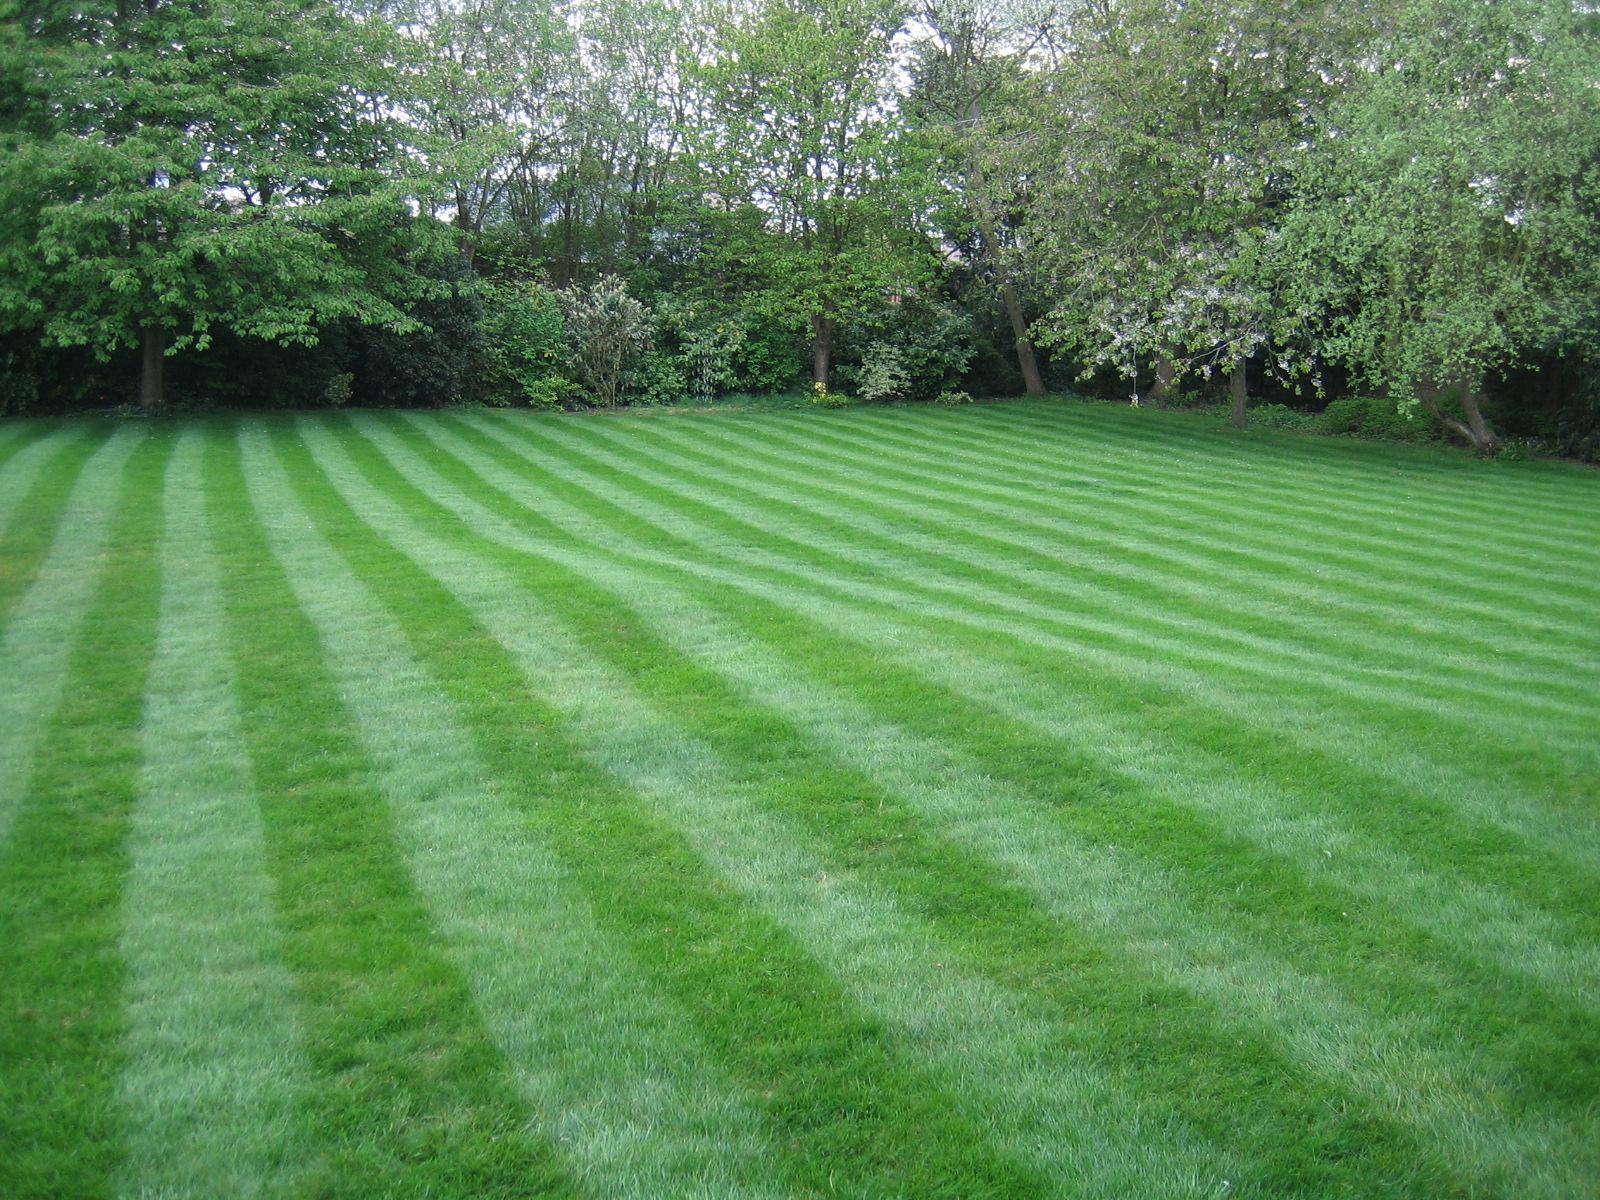 Professional Lawn Maintenance in Whippany NJ